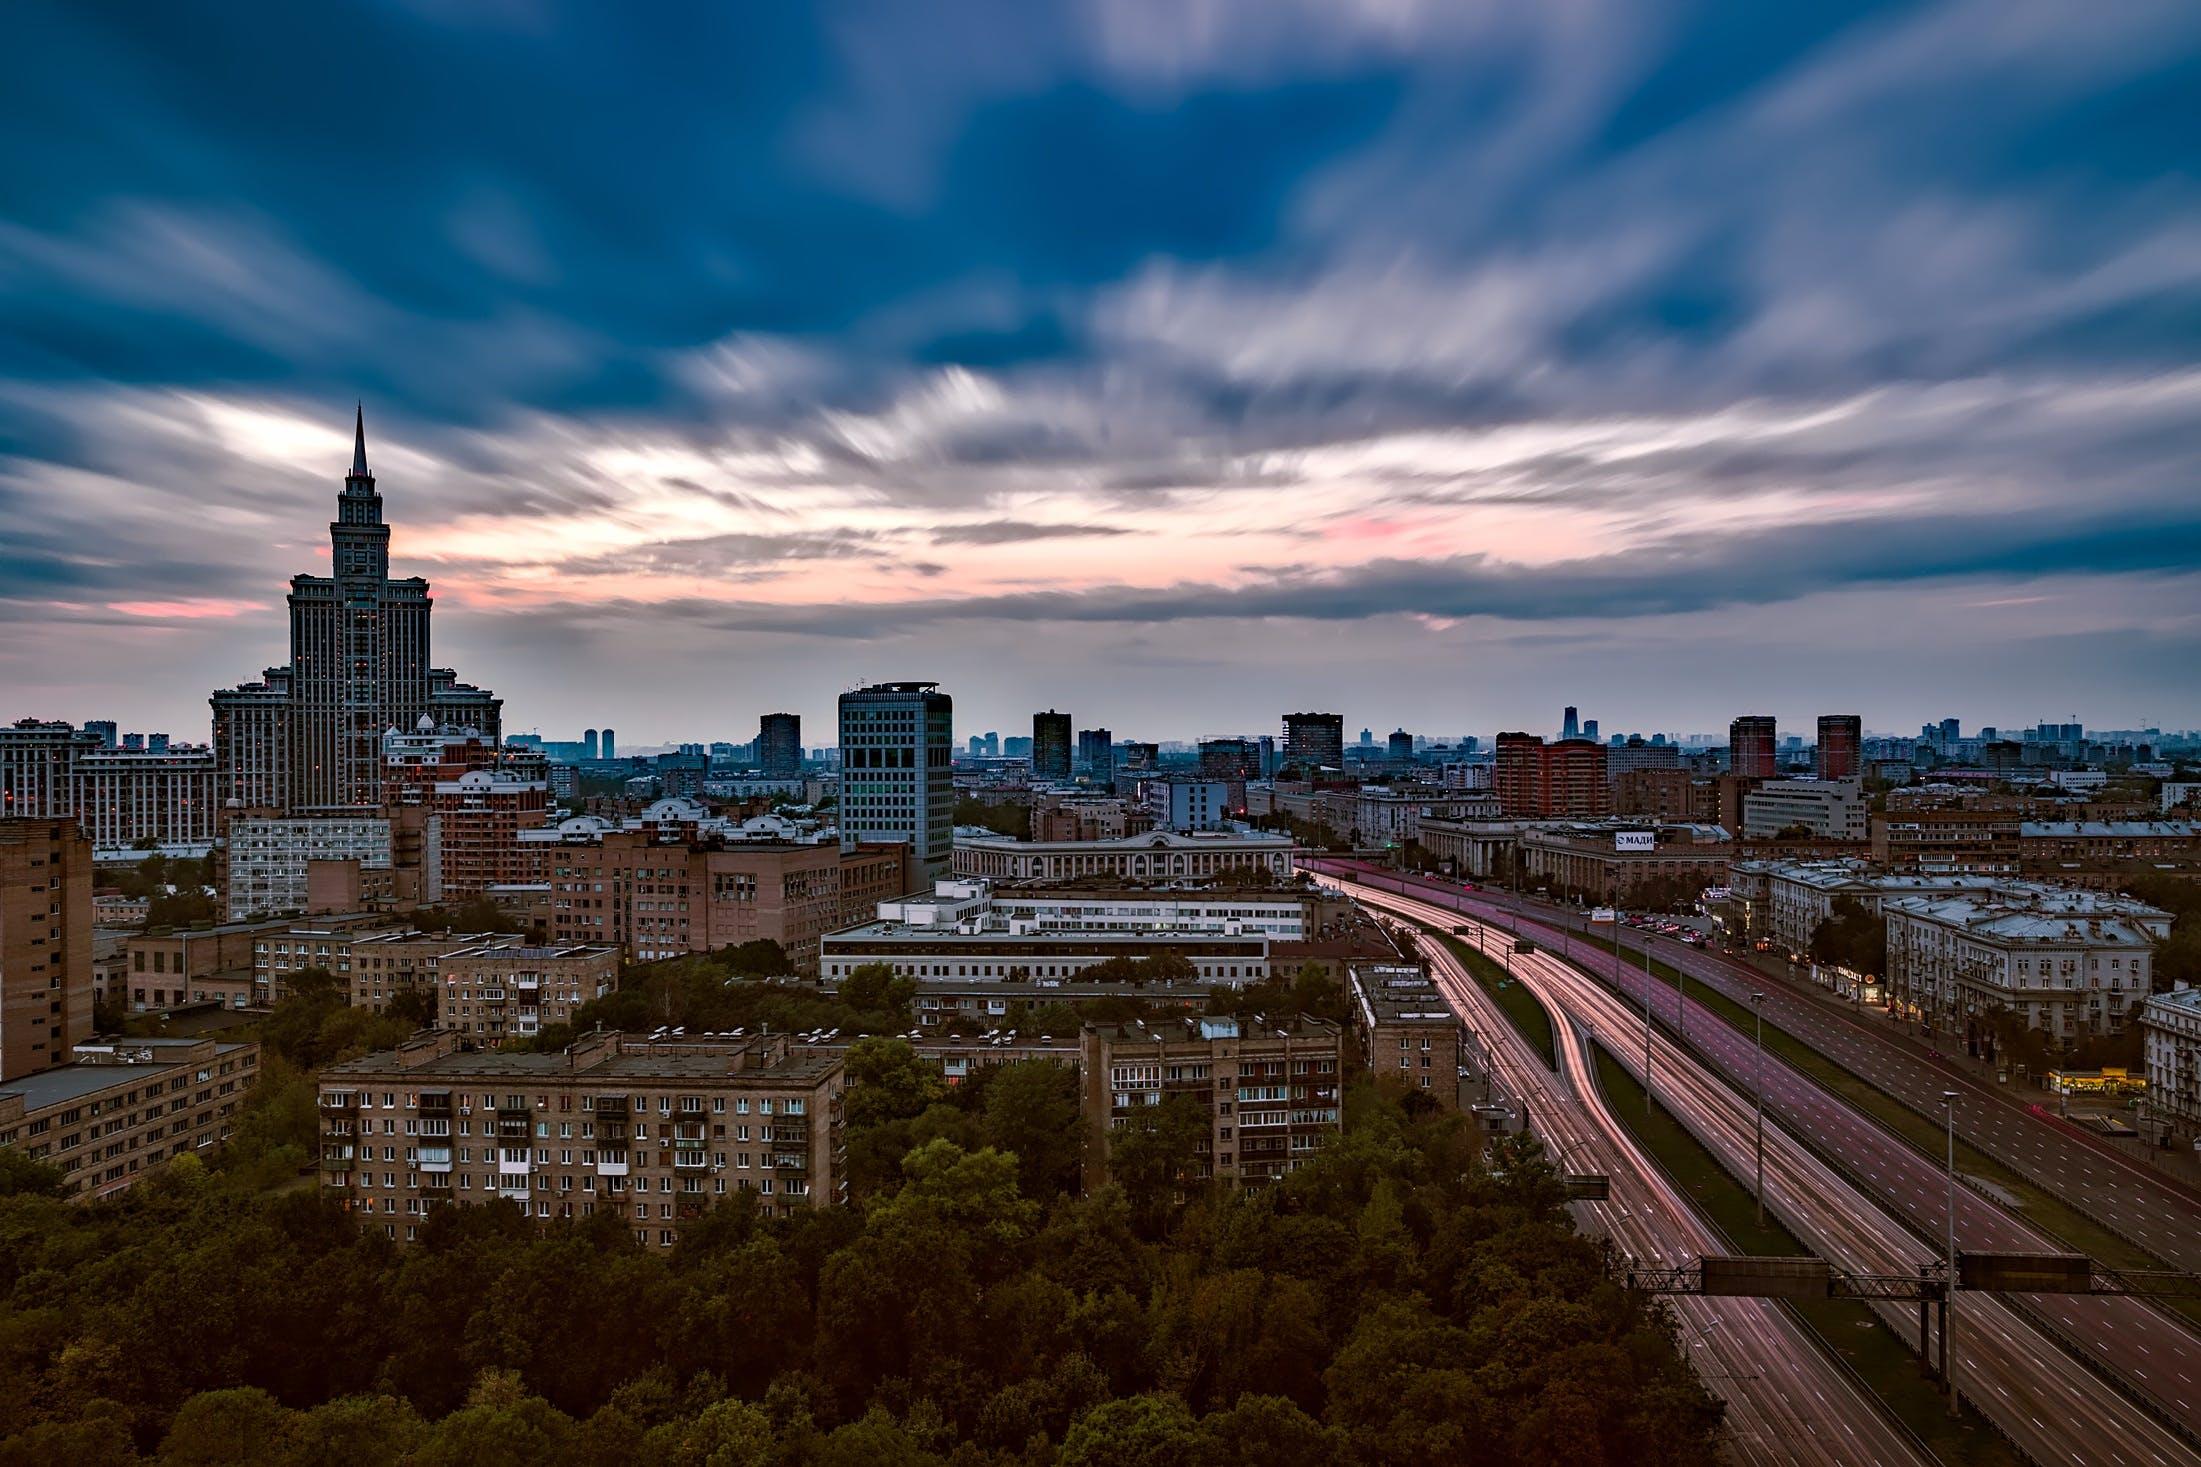 Free stock photo of city, streets, sky, sunset